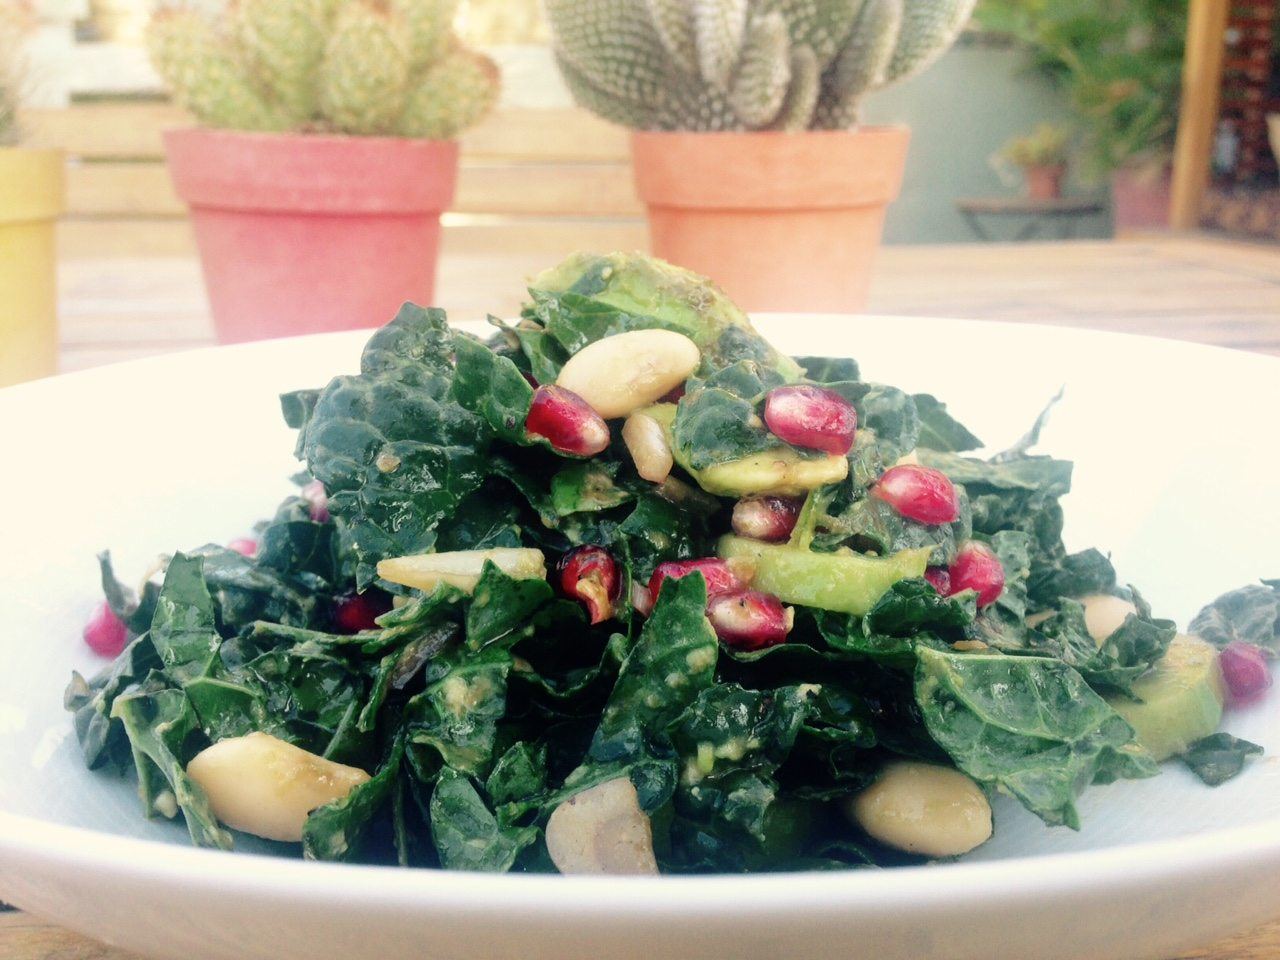 toronto-chefs-restaurants-consumed-bob-blumer-food-network-surreal-gourmet-kale-salad